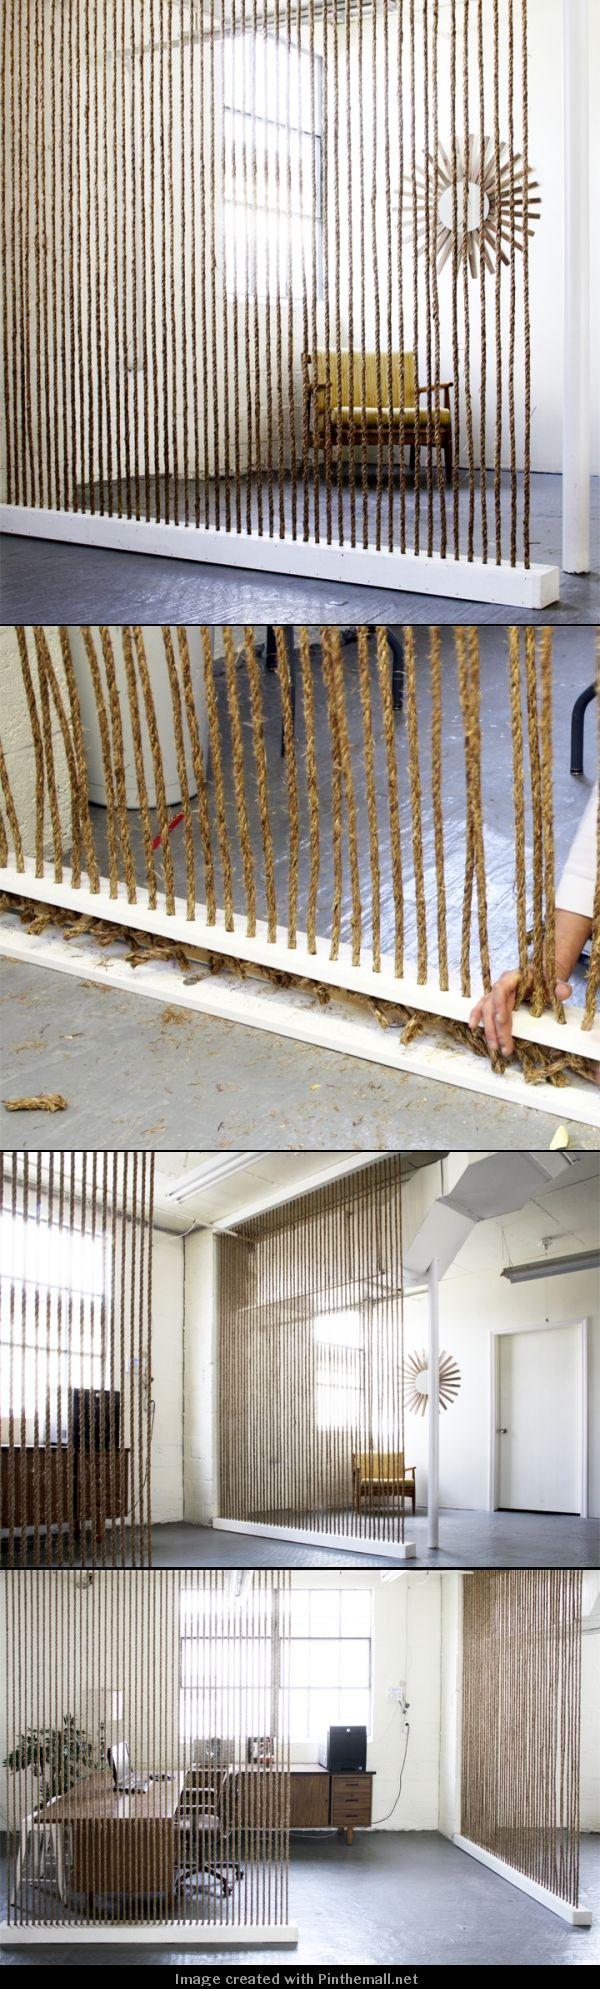 DIY HOME DECOR AND INTERIOR: DIY ROPE WALL